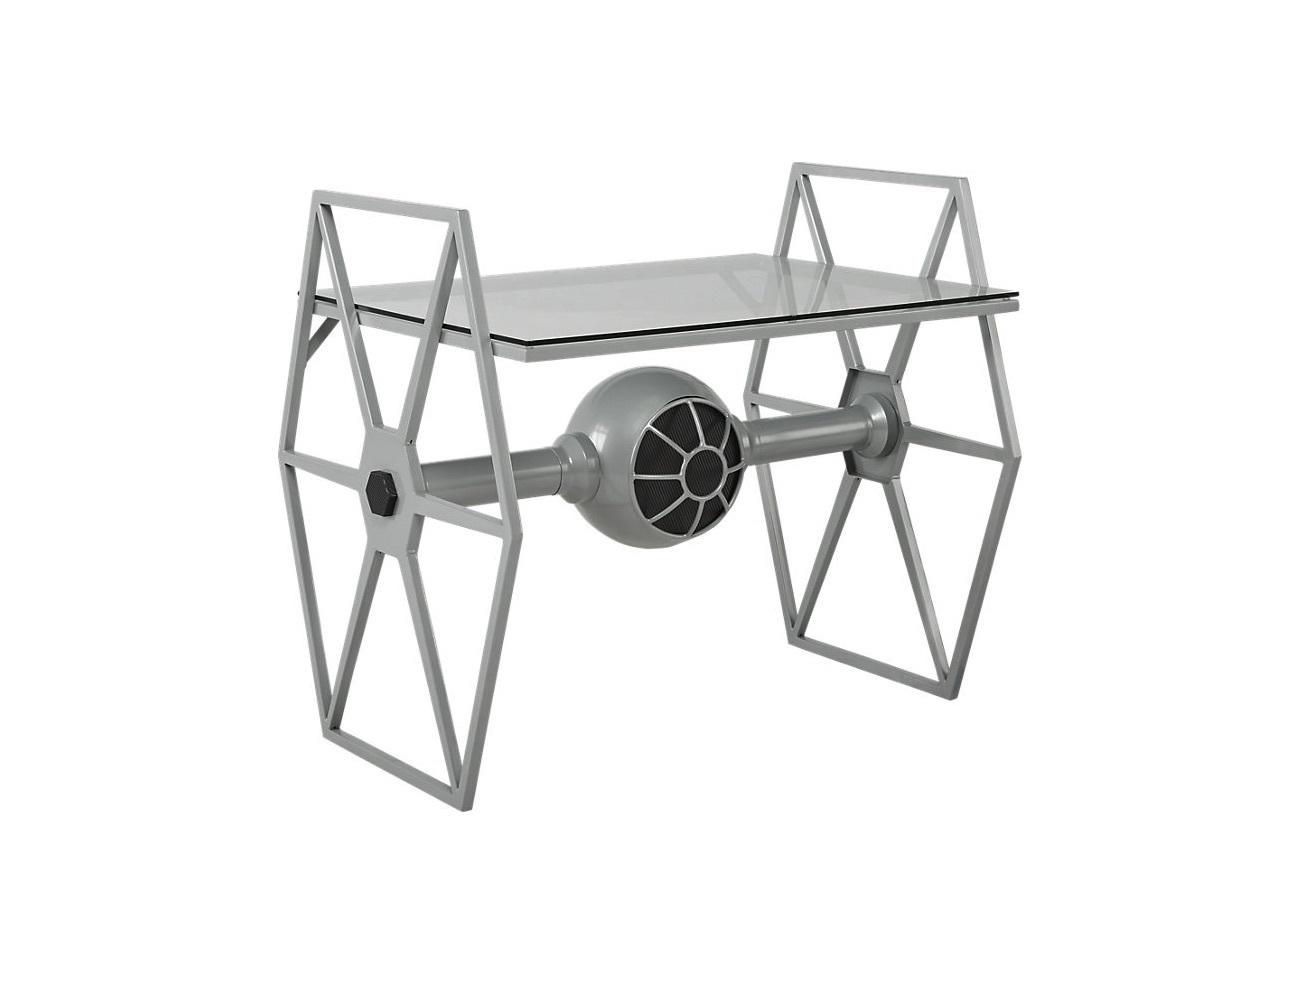 Star Wars Tie Fighter Gray Desk 187 Gadget Flow